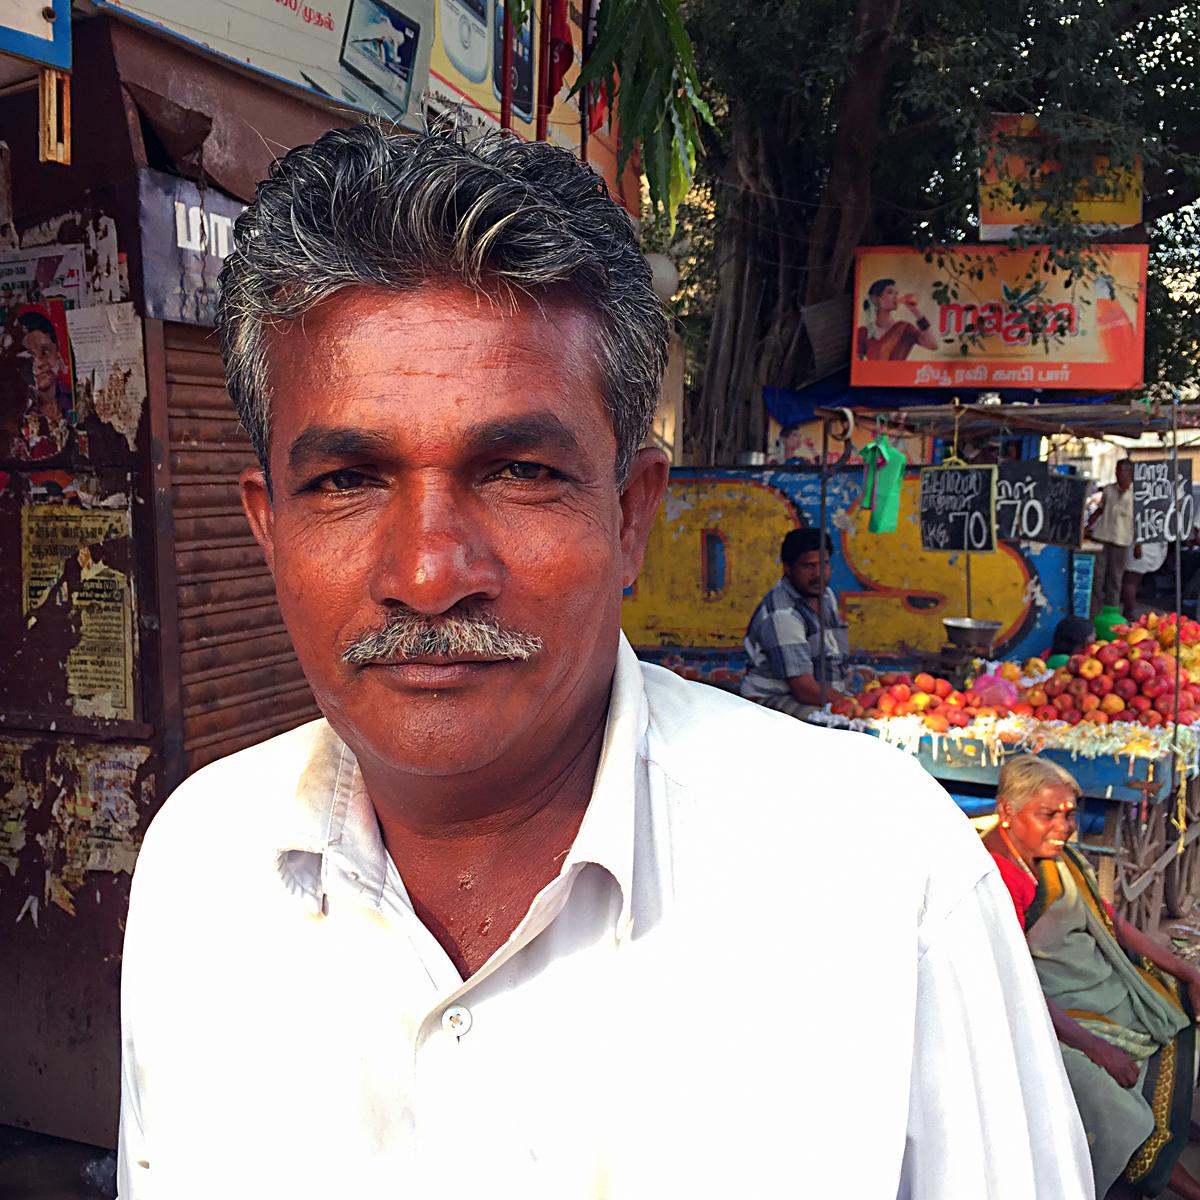 INDIEN Chennai Kanchipuram Tempel Menschen Tempel FINEST-onTour 2170.jpg